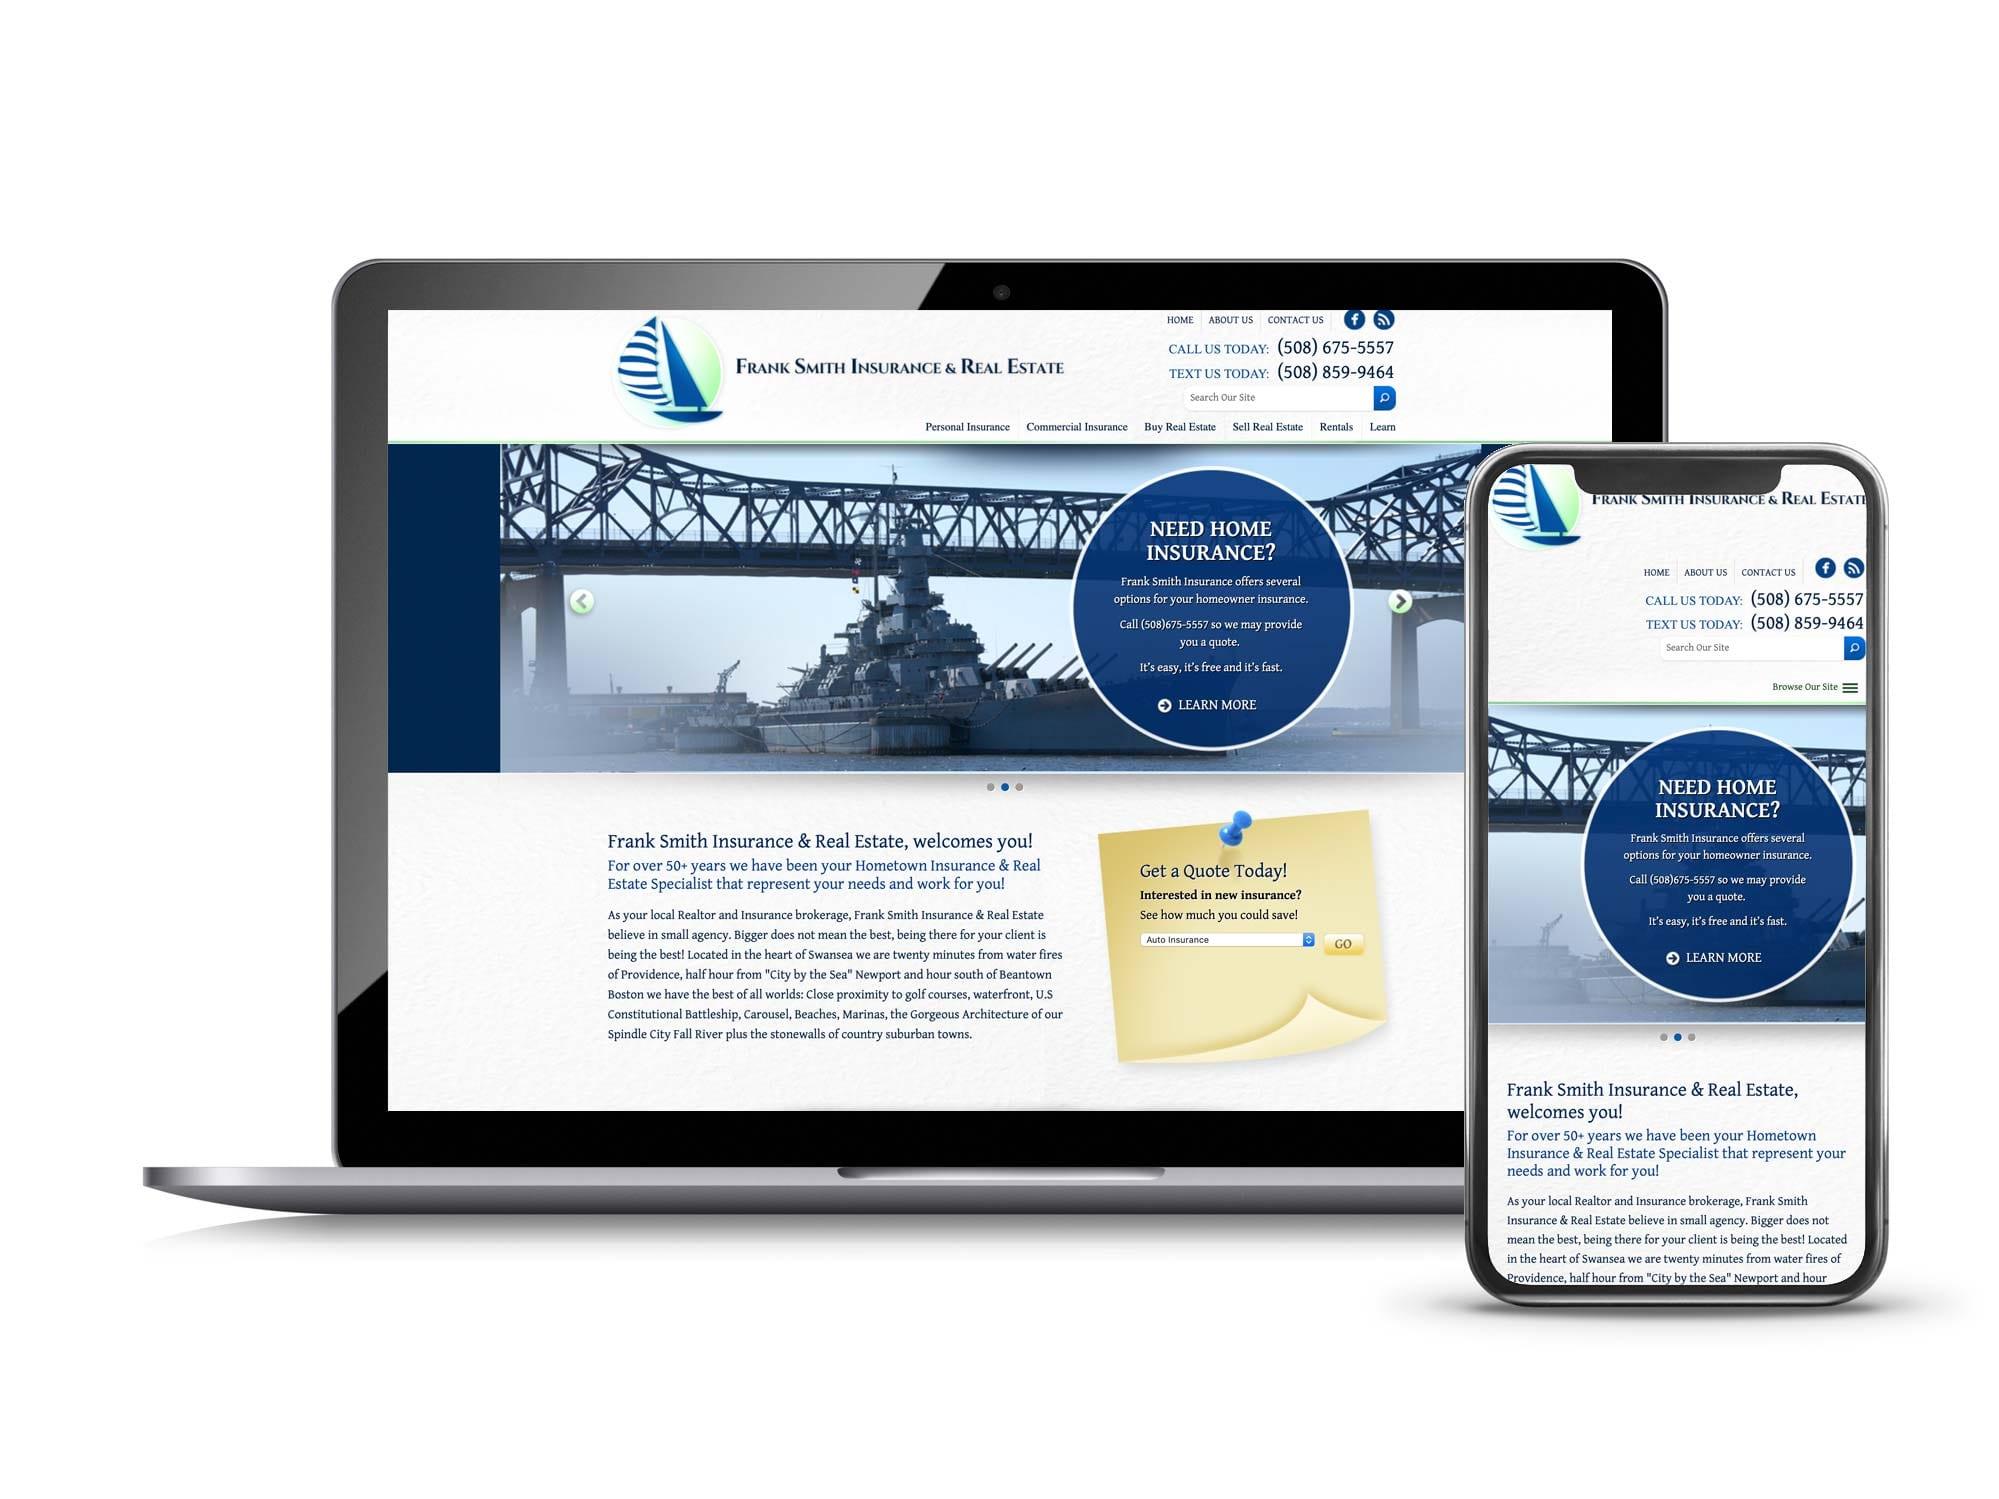 Frank Smith Insurance & Real Estate Swansea, MA